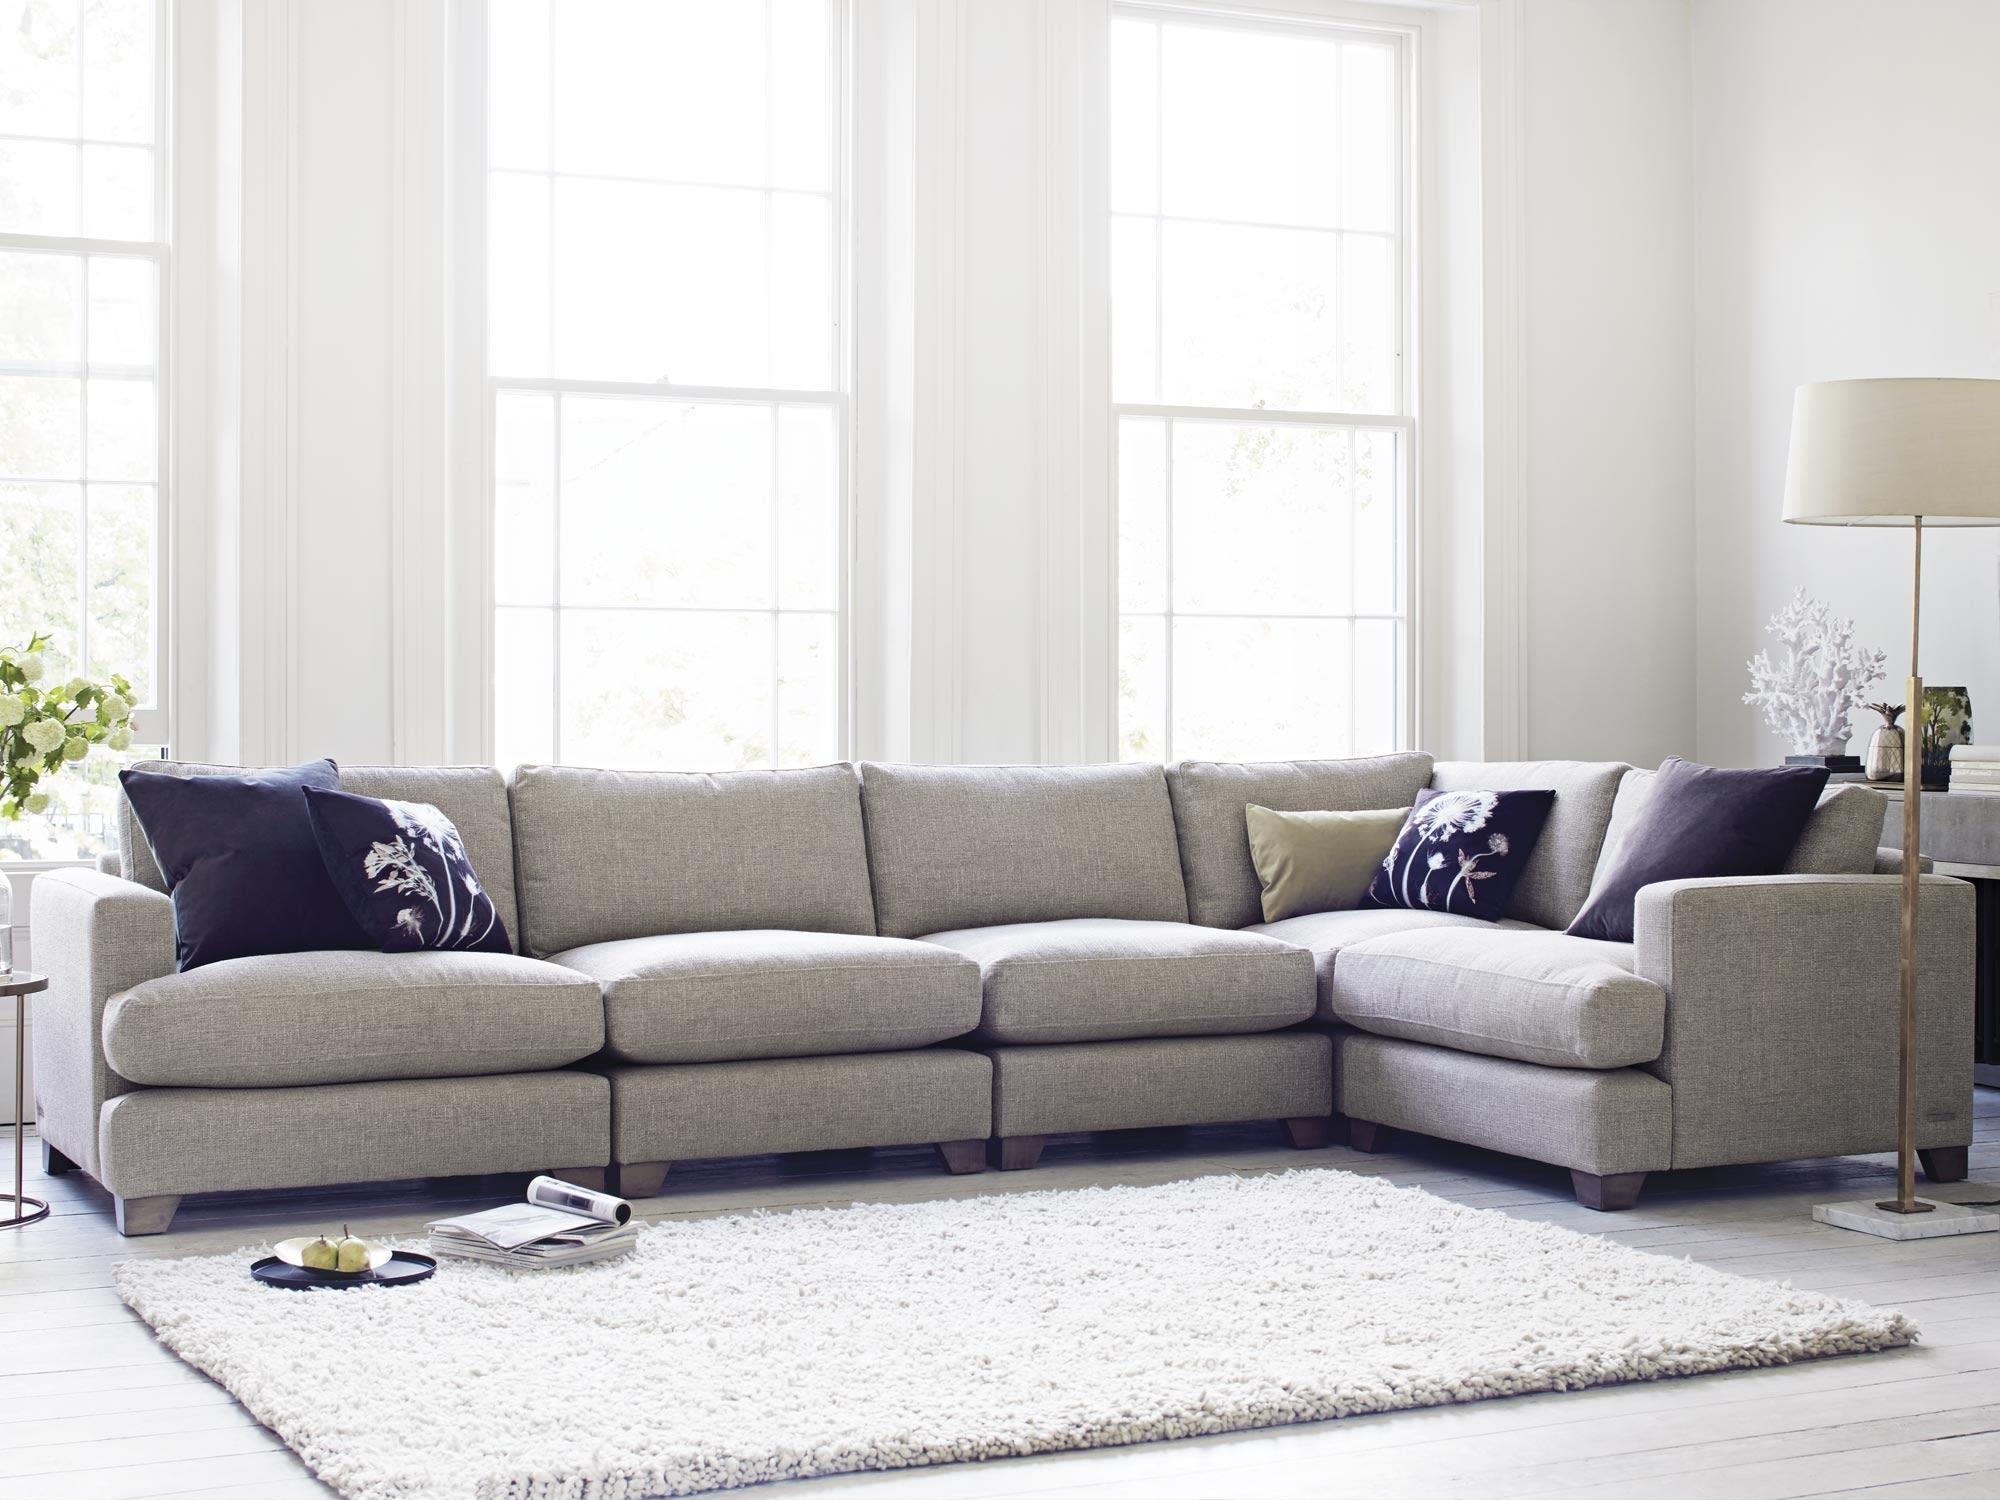 Modular Corner Sofa (View 3 of 20)